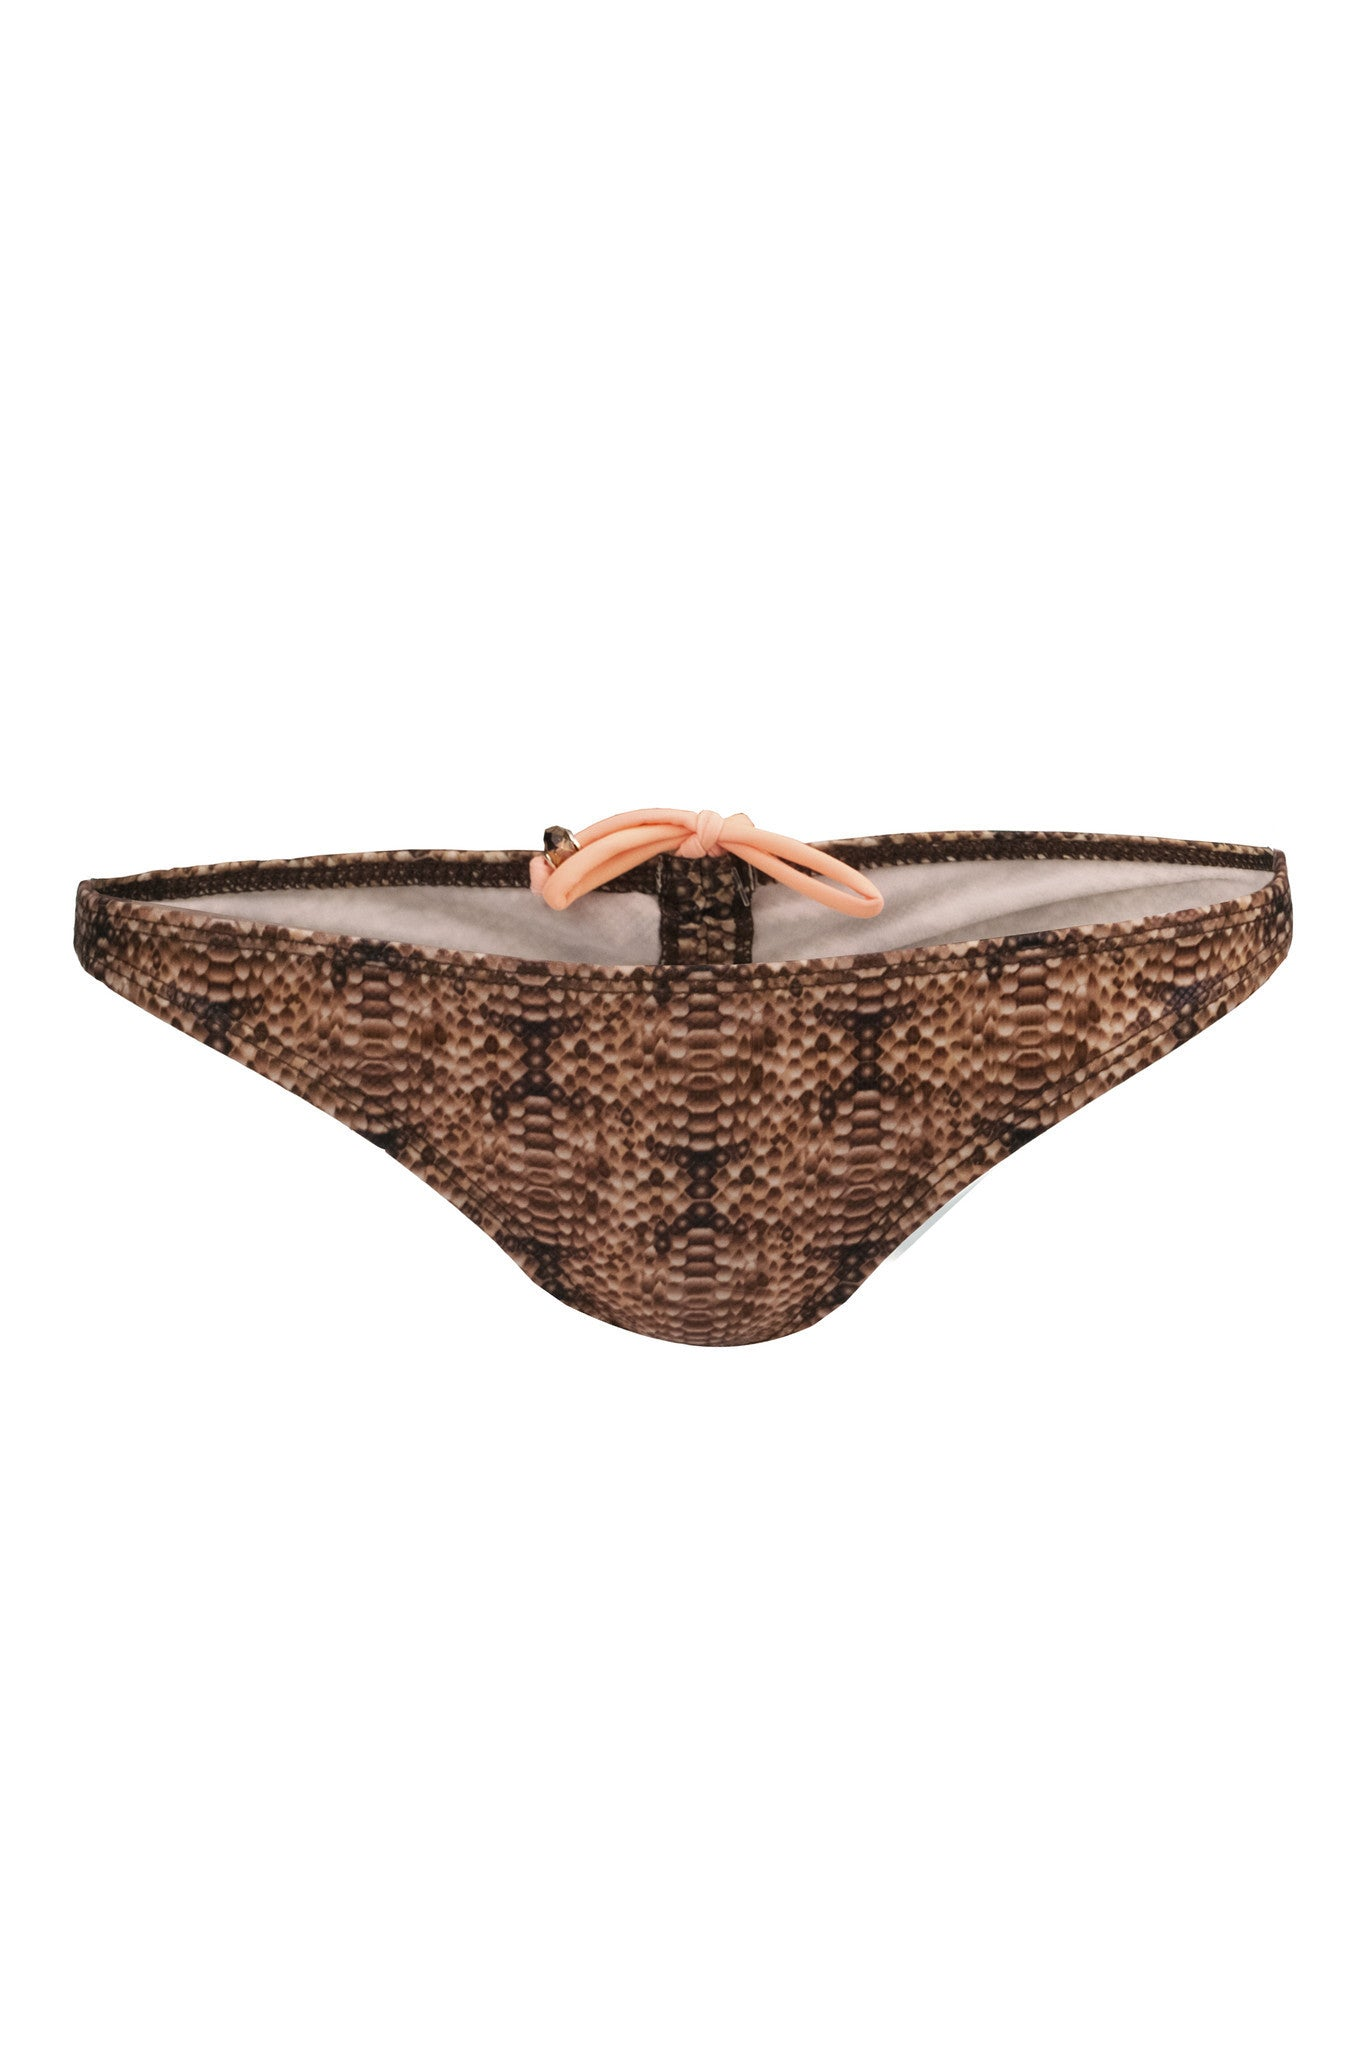 KAIMANA Drawstring Back Bottom Bikini Bottom | Cobra|